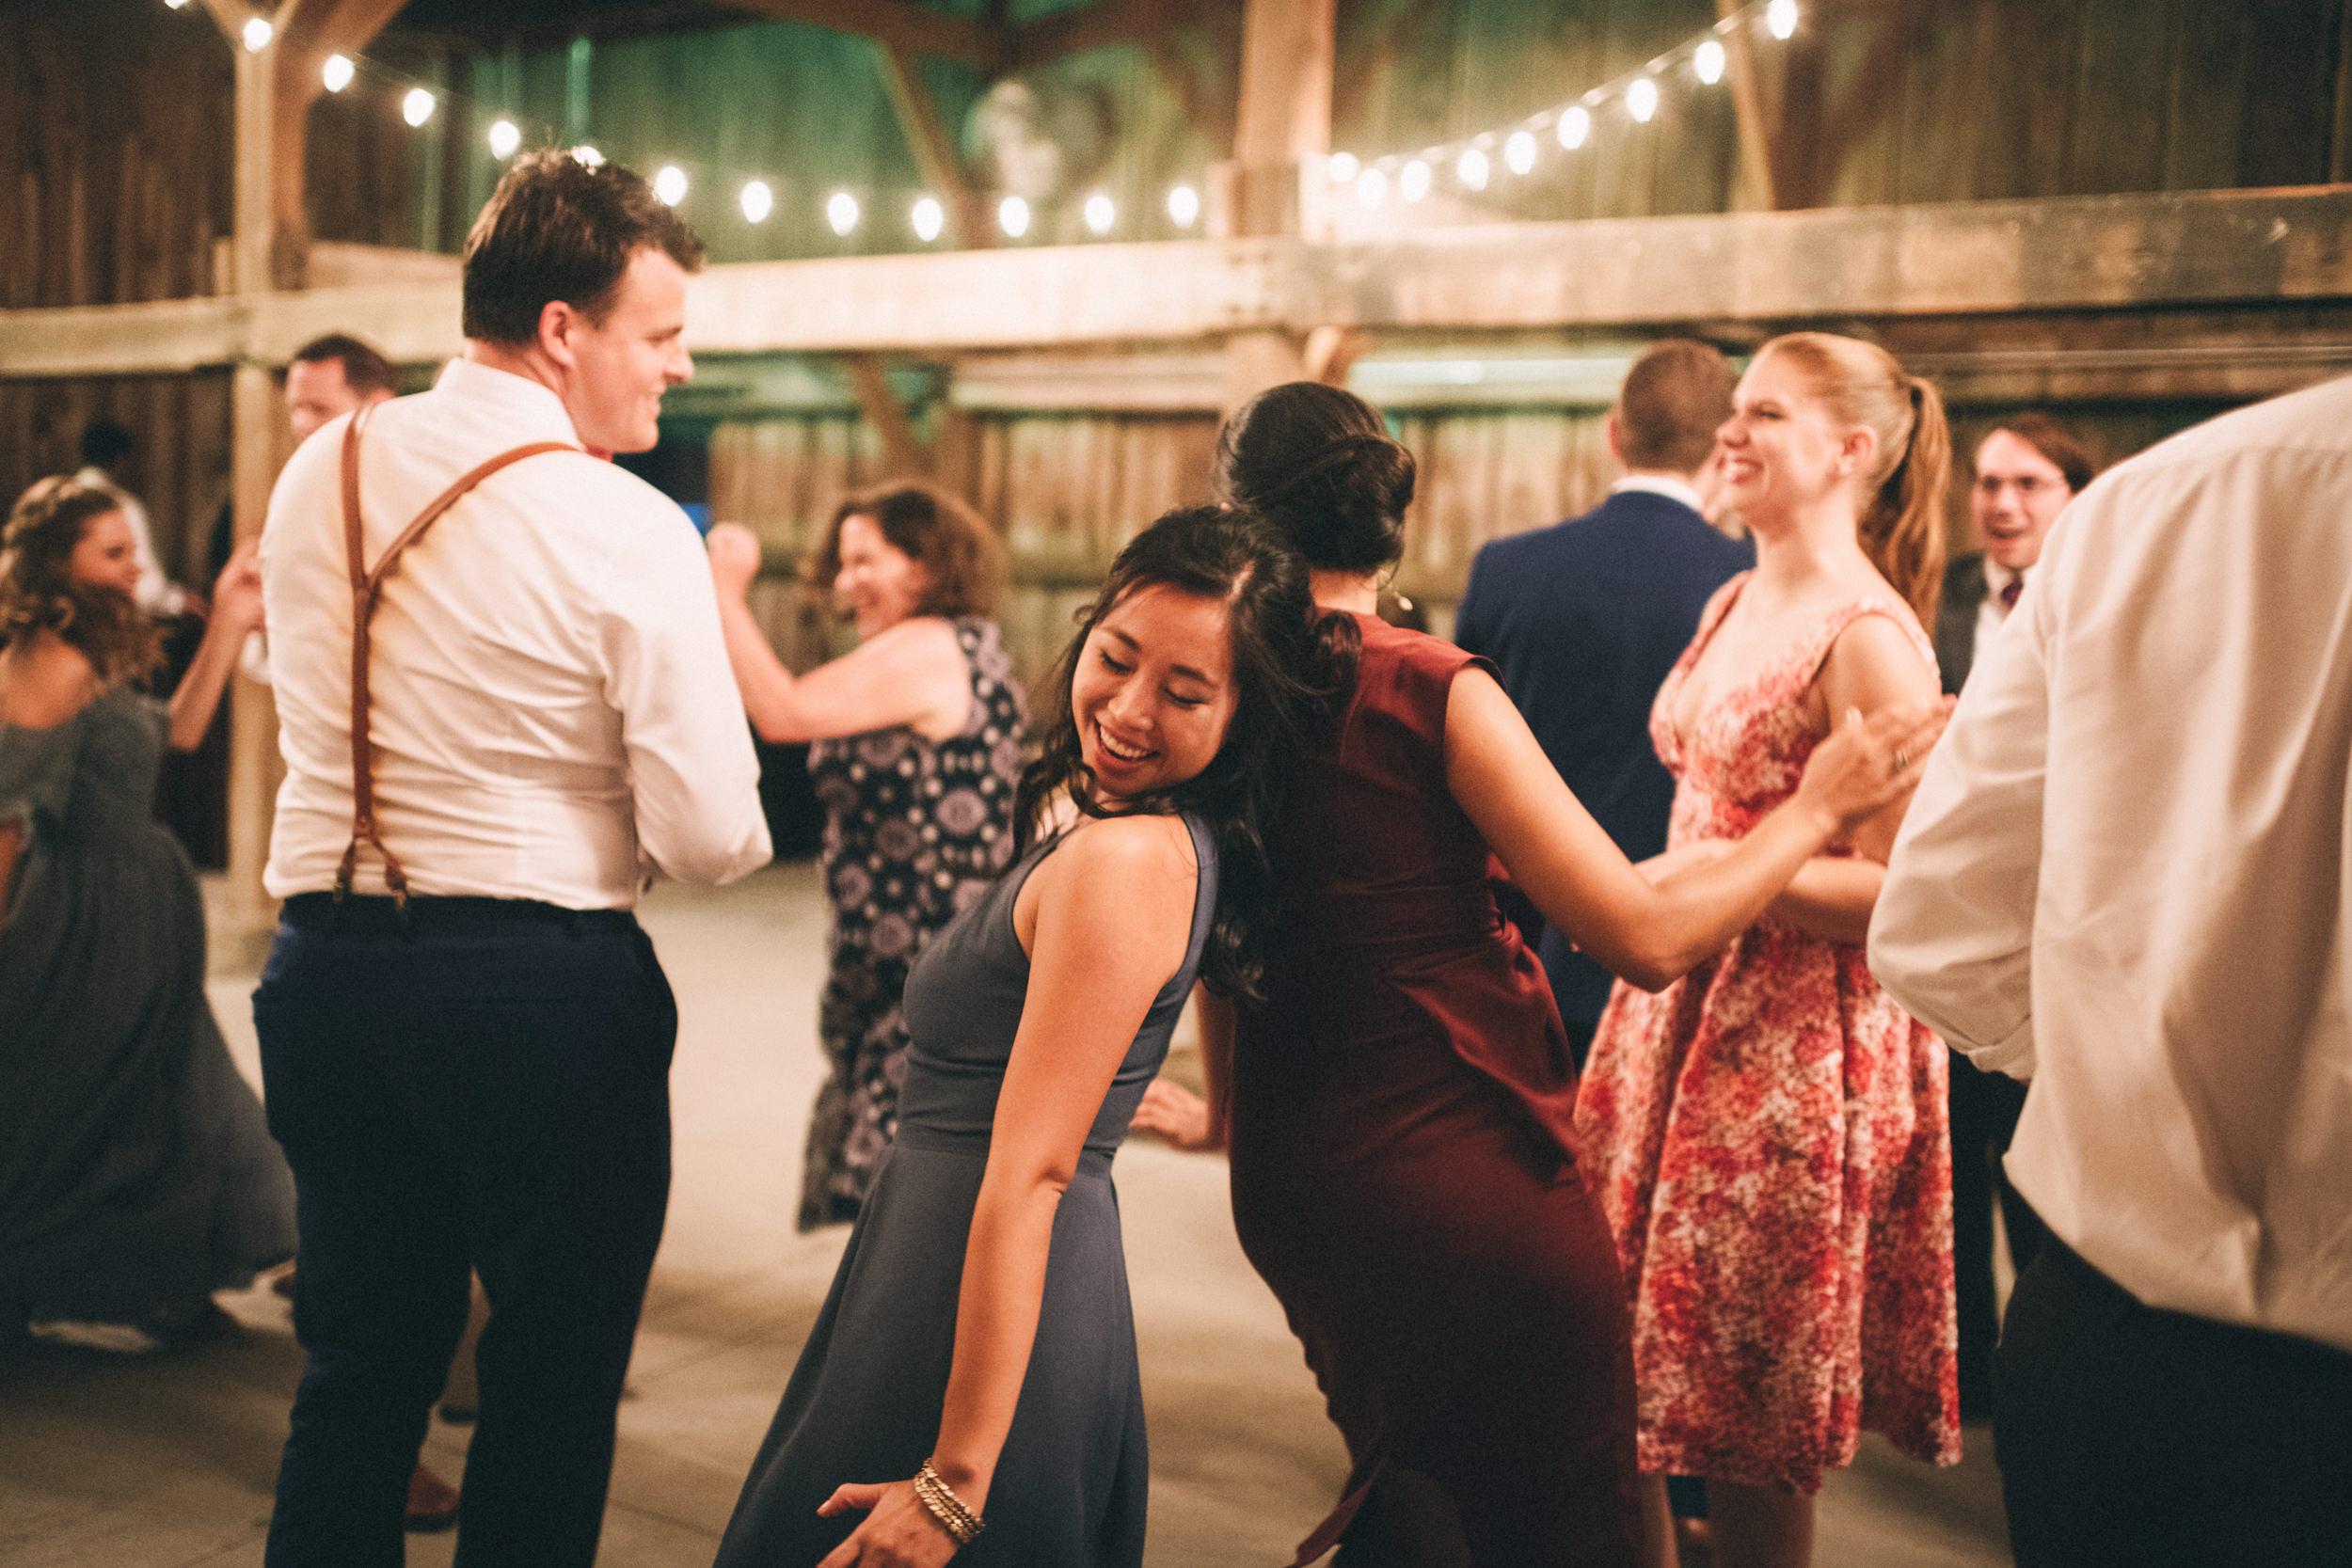 Louisville-Kentucky-Wedding-and-Elopement-Photographer-Sarah-Katherine-Davis-Photography-Summer-Jewel-Toned-Wedding-Chineese-Tea-Ceremony-Warrenwood-Manor-Danville-966.jpg